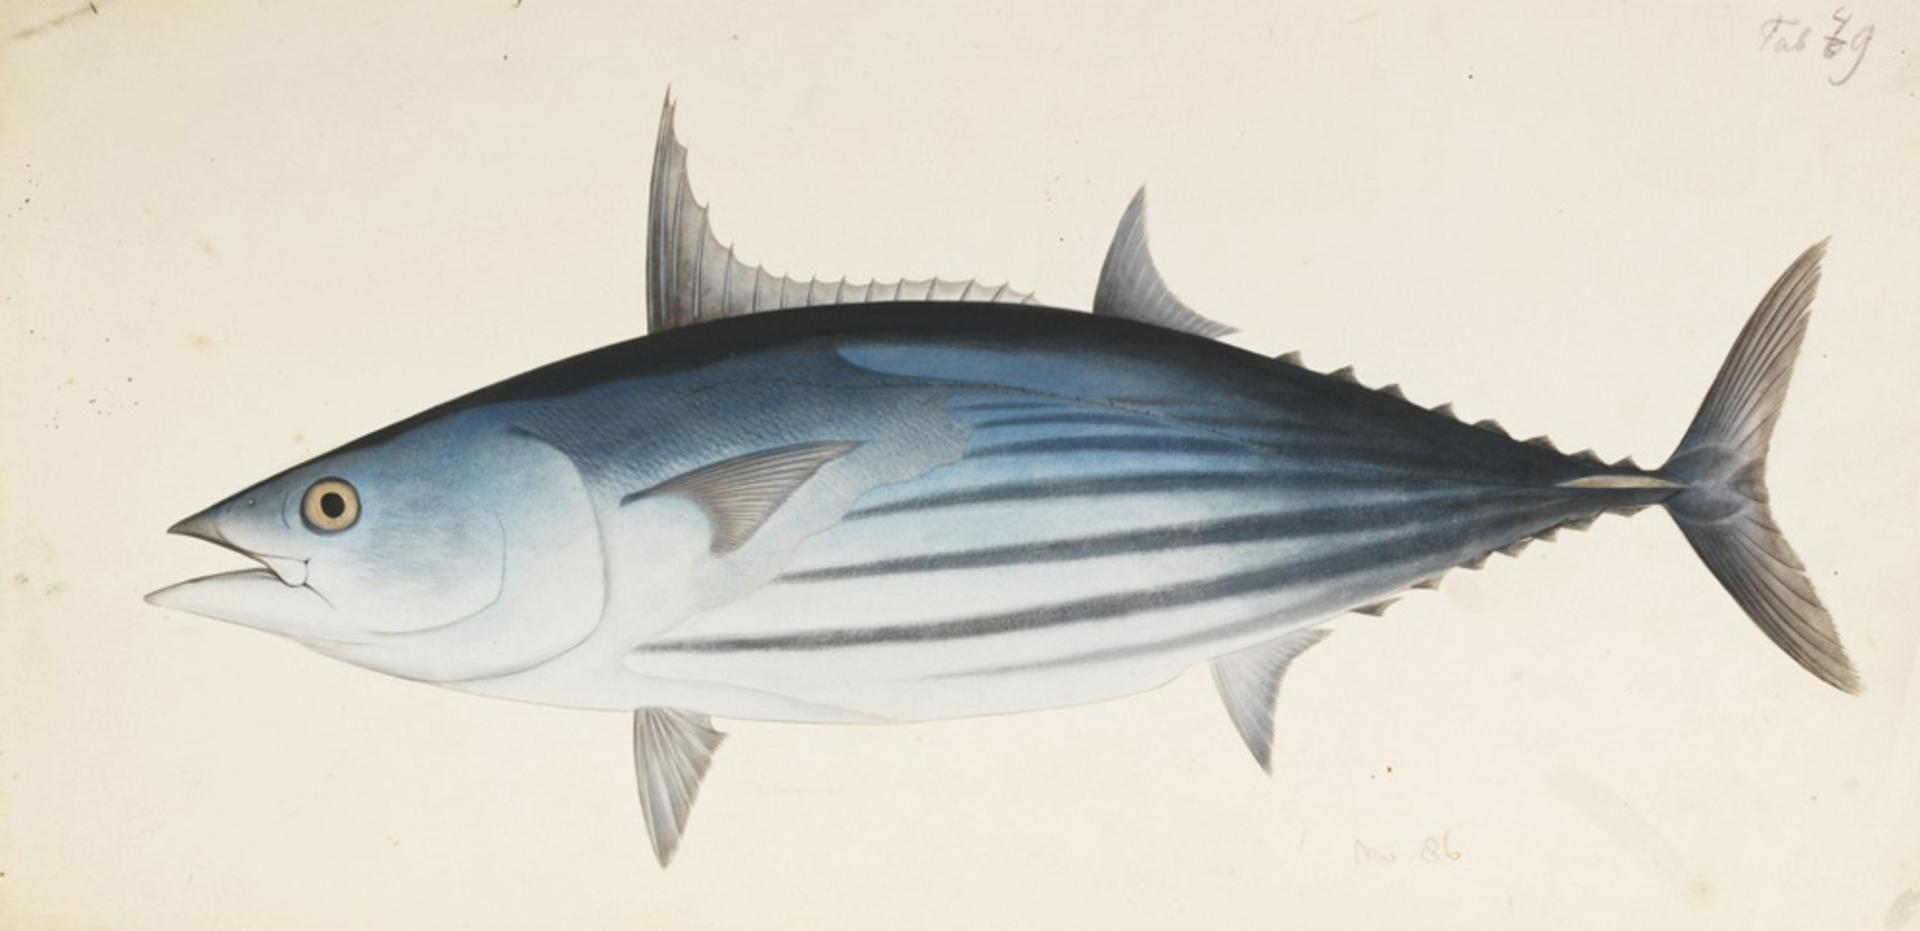 RMNH.ART.563 | Katsuwonus pelamis